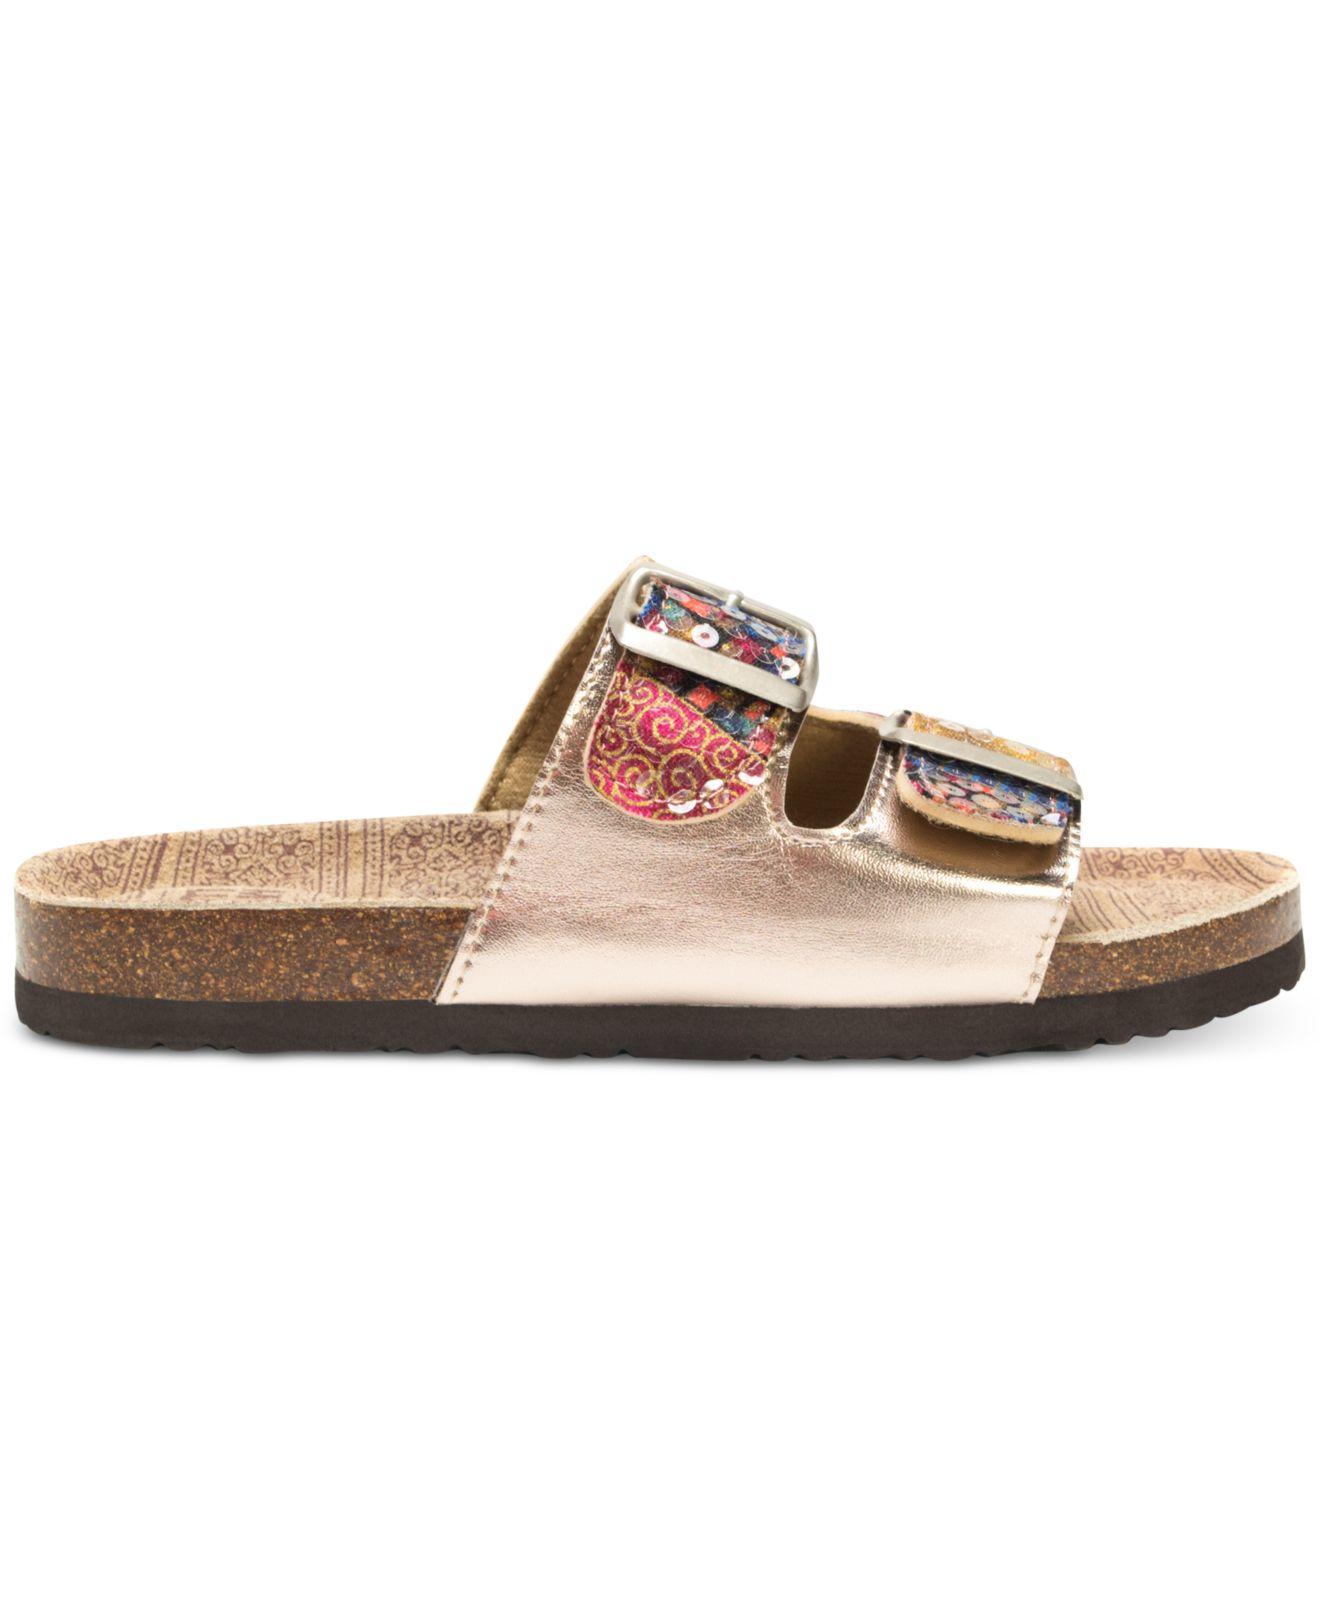 45aee80b7b64 Lyst - Muk Luks ® Marla Double-strap Slide-on Sandals